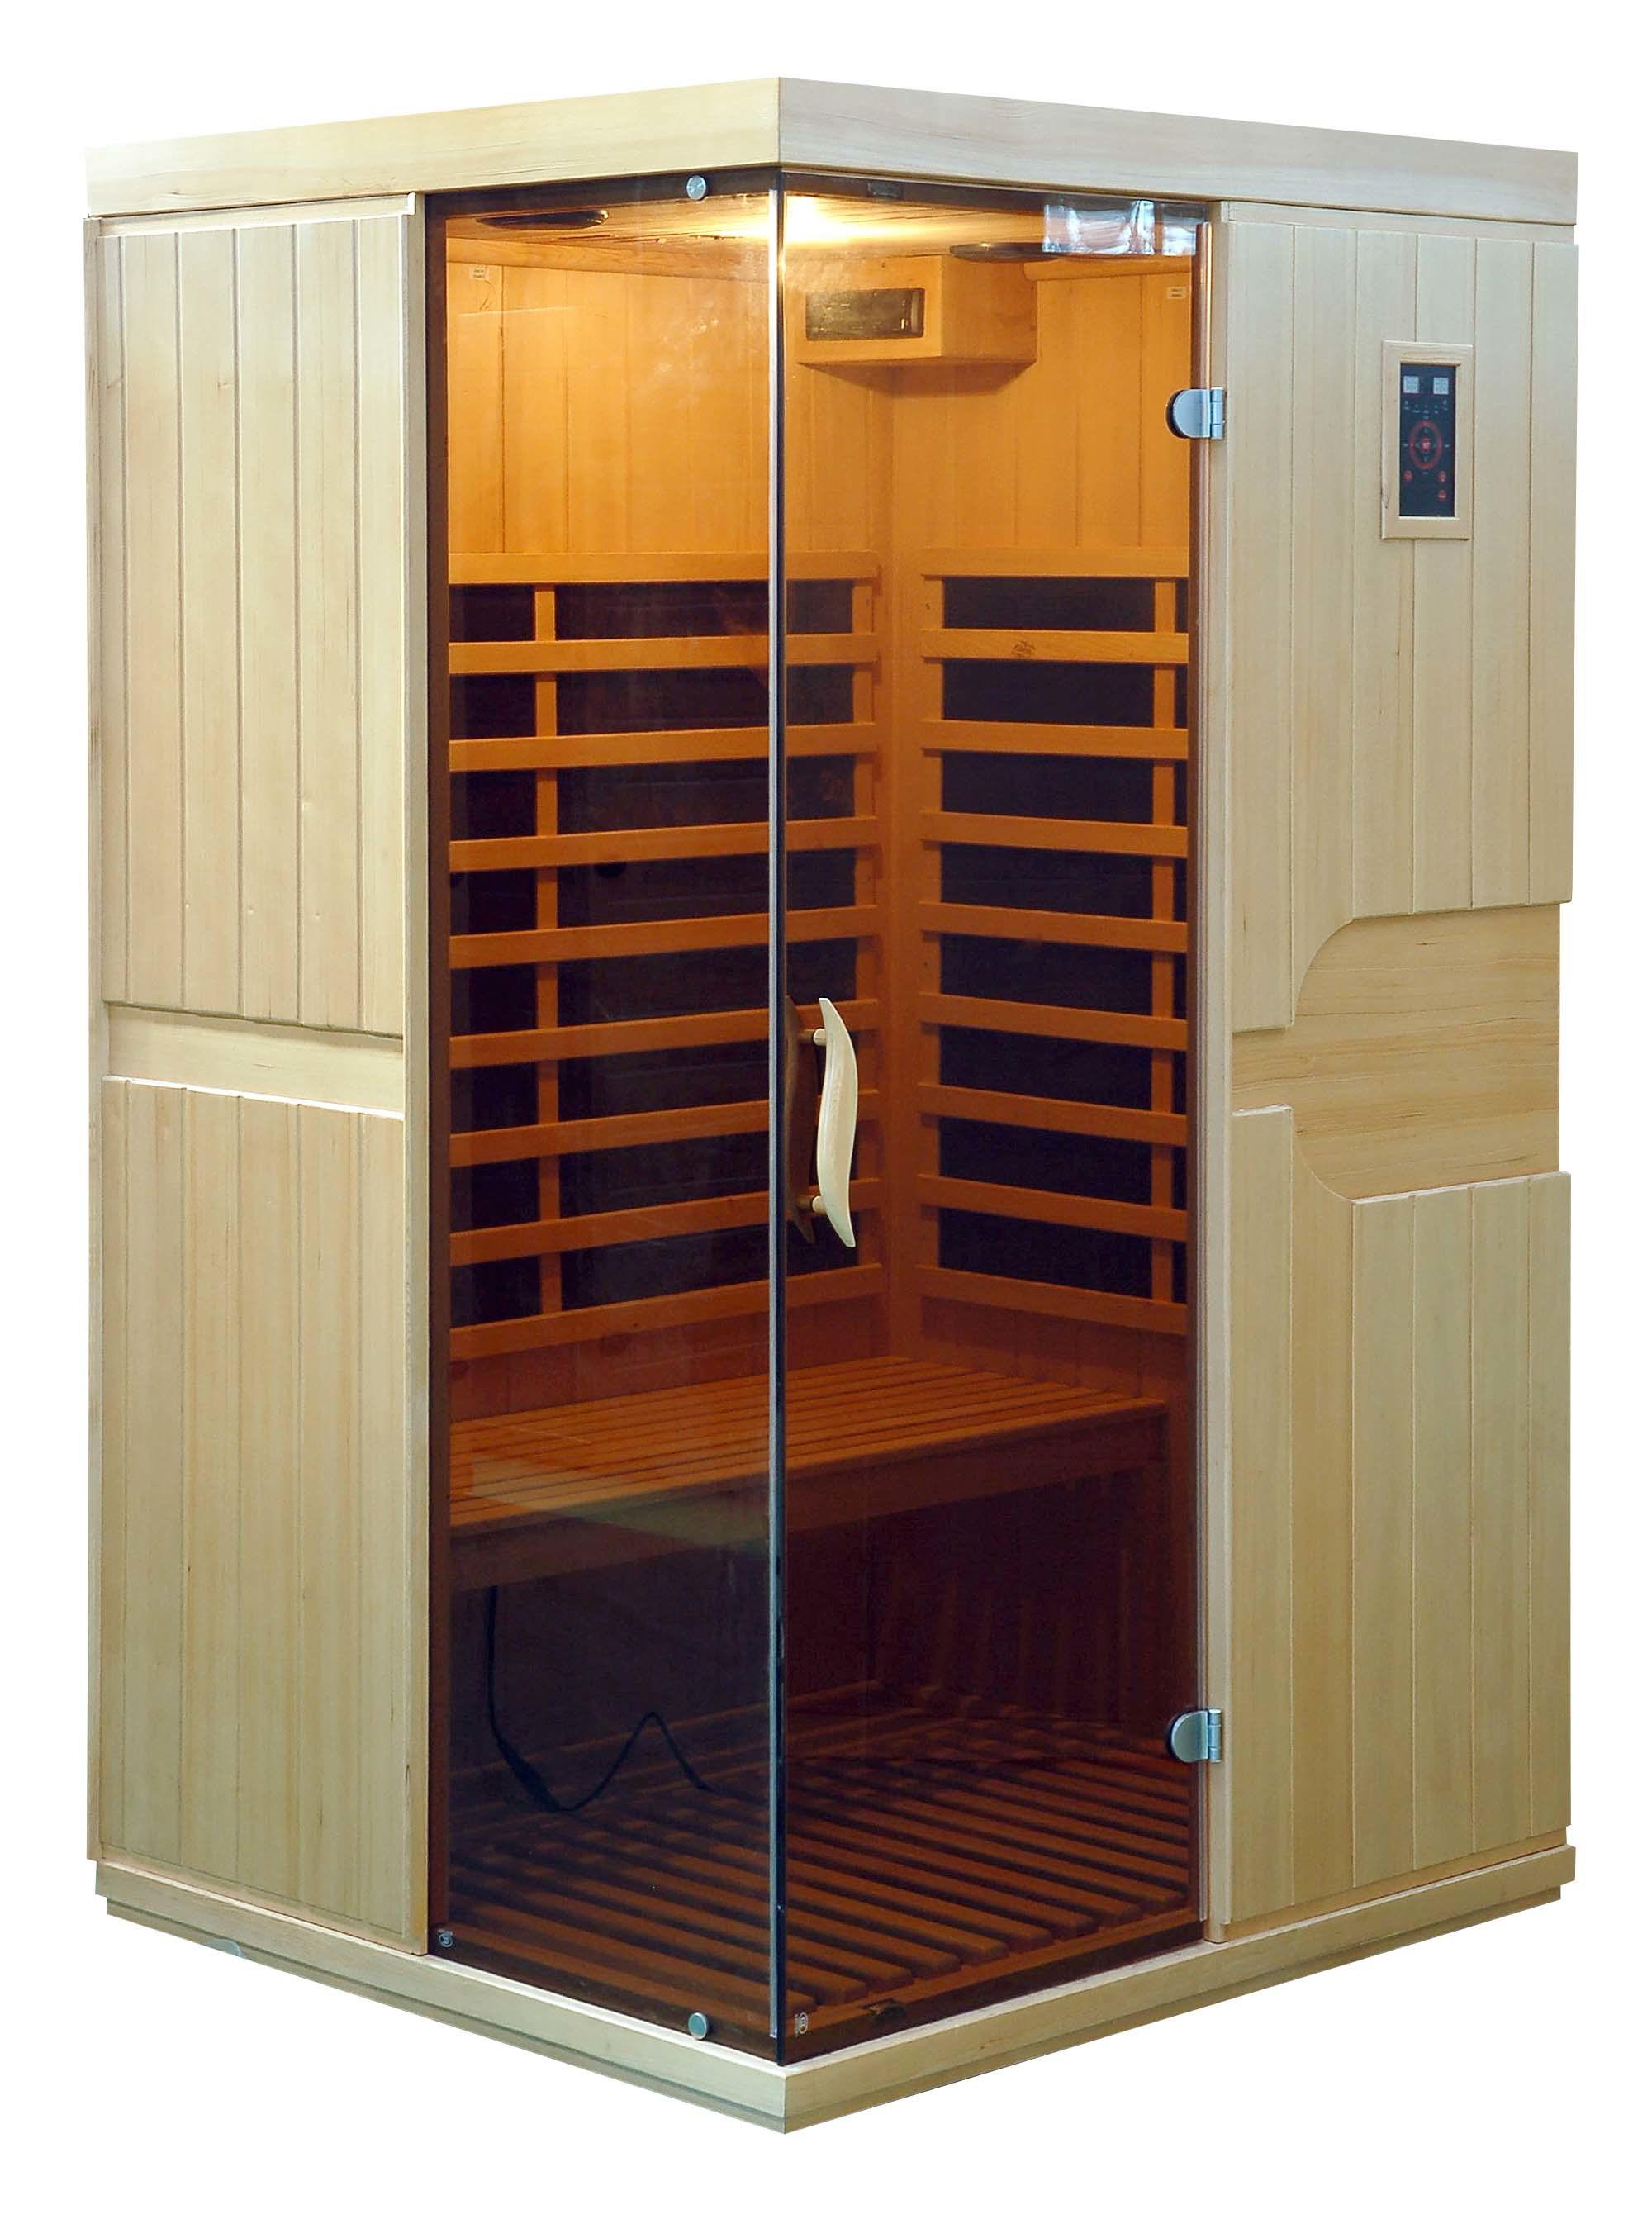 016new Hemlock Far Infrared Sauna Room with Carbon Heater